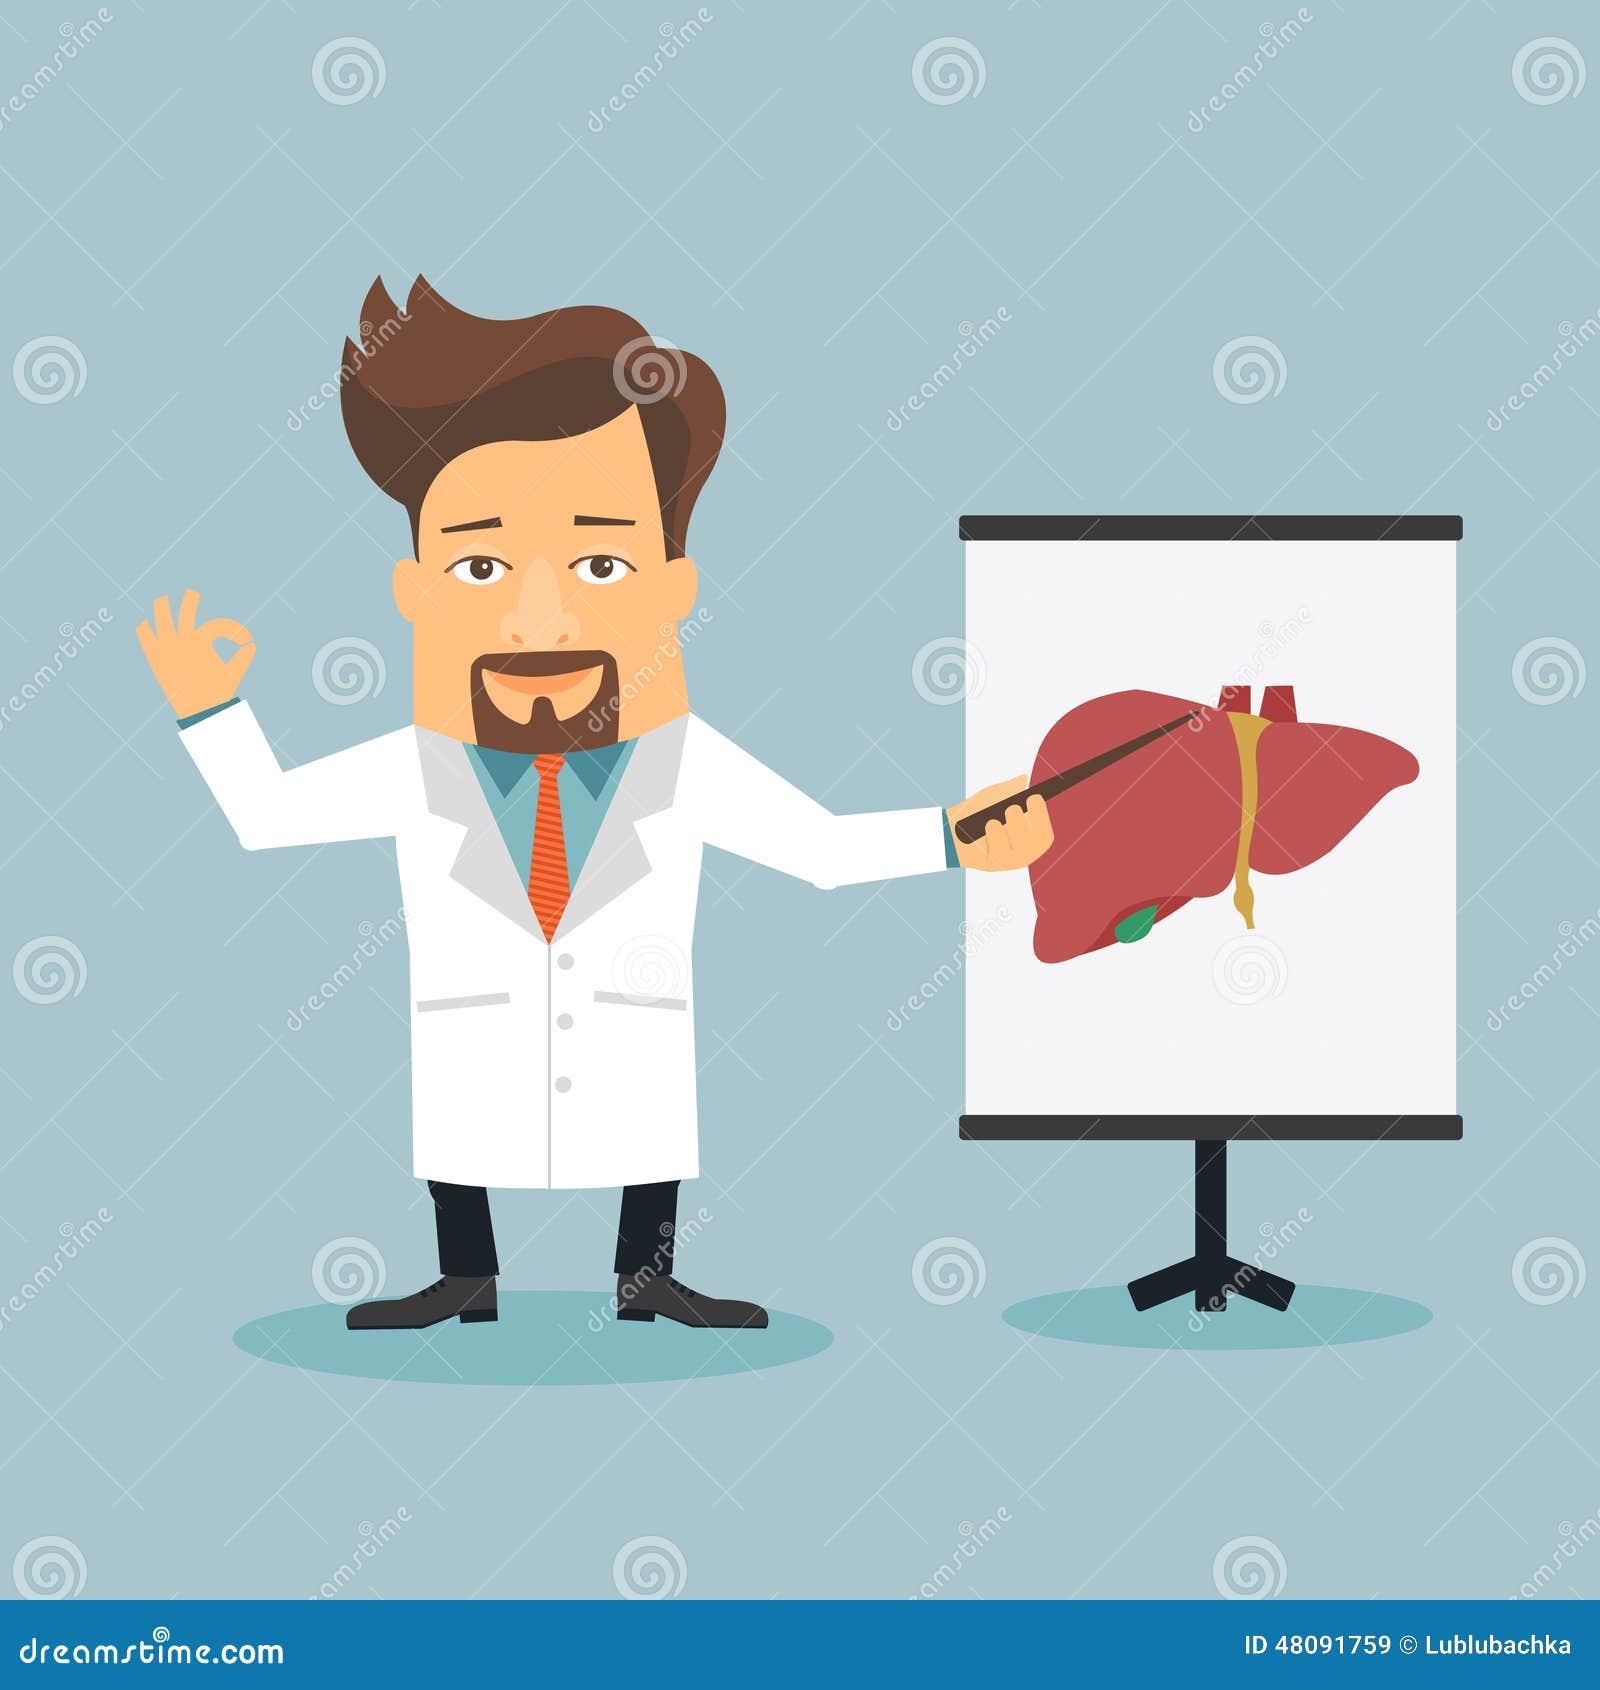 Friendly doctor therapist flat cartoon character stock - Imagenes de animacion ...